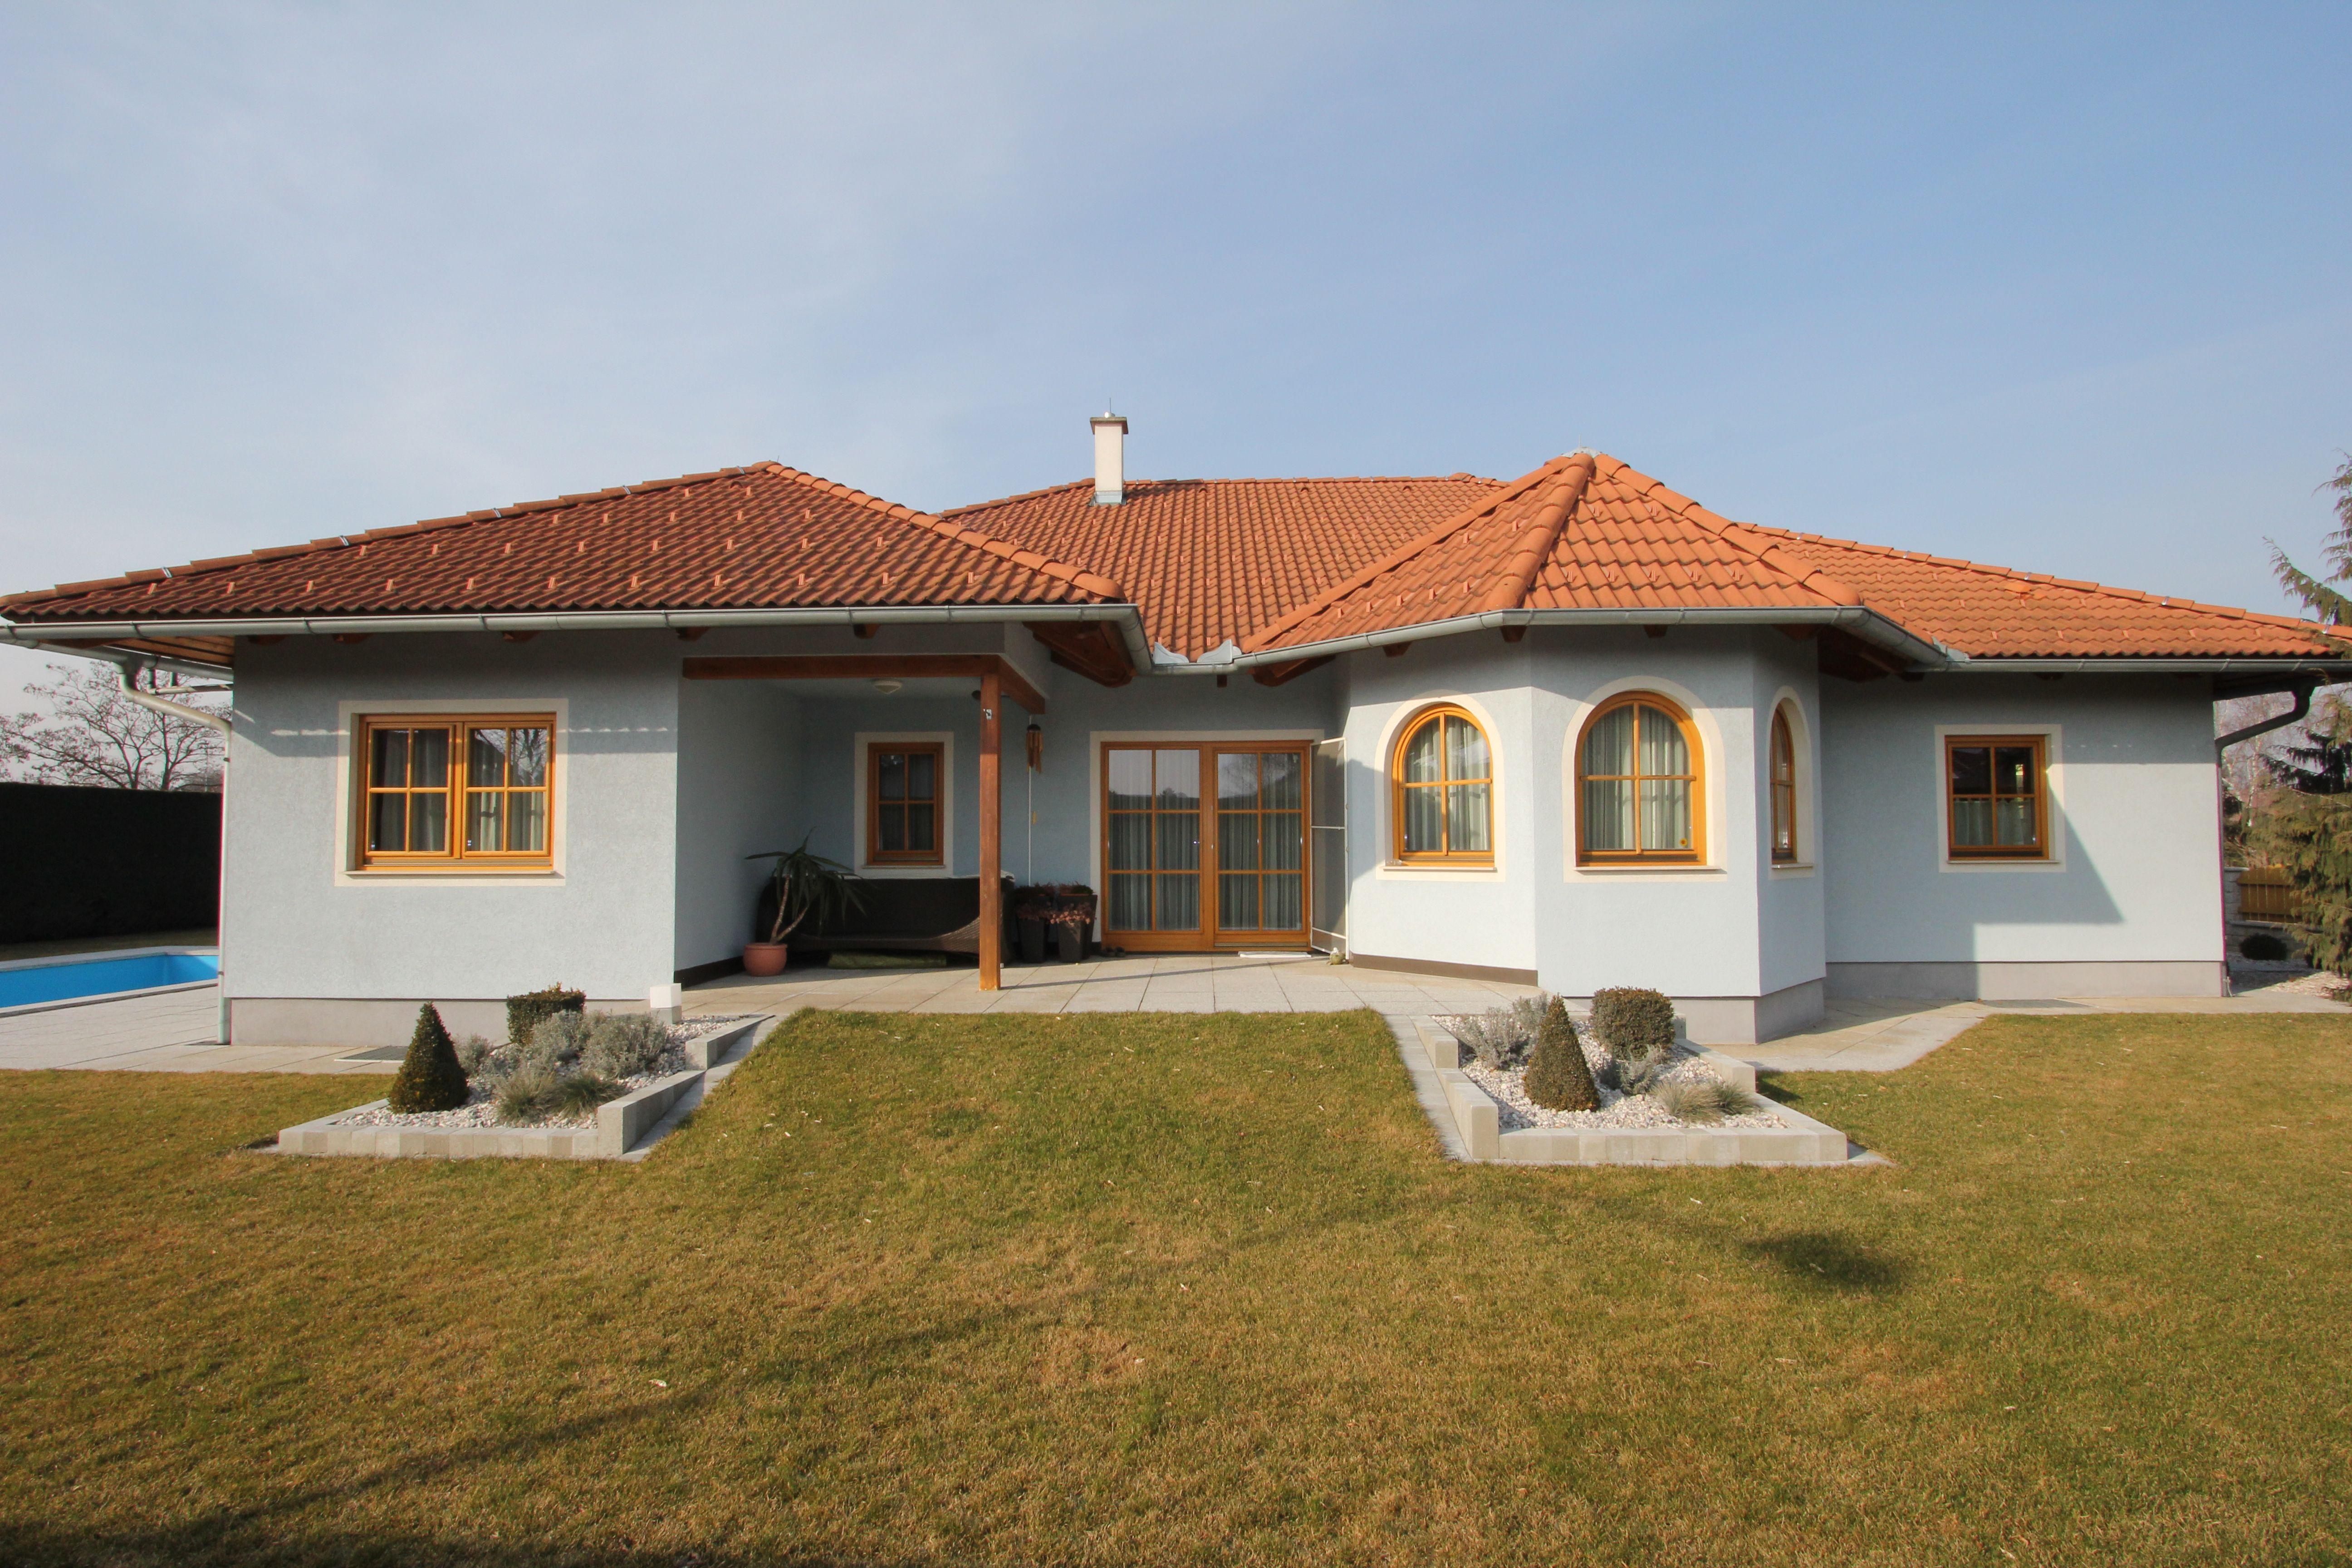 Einfamilienhaus mit Pool in Sollenau, Bezirk Wiener